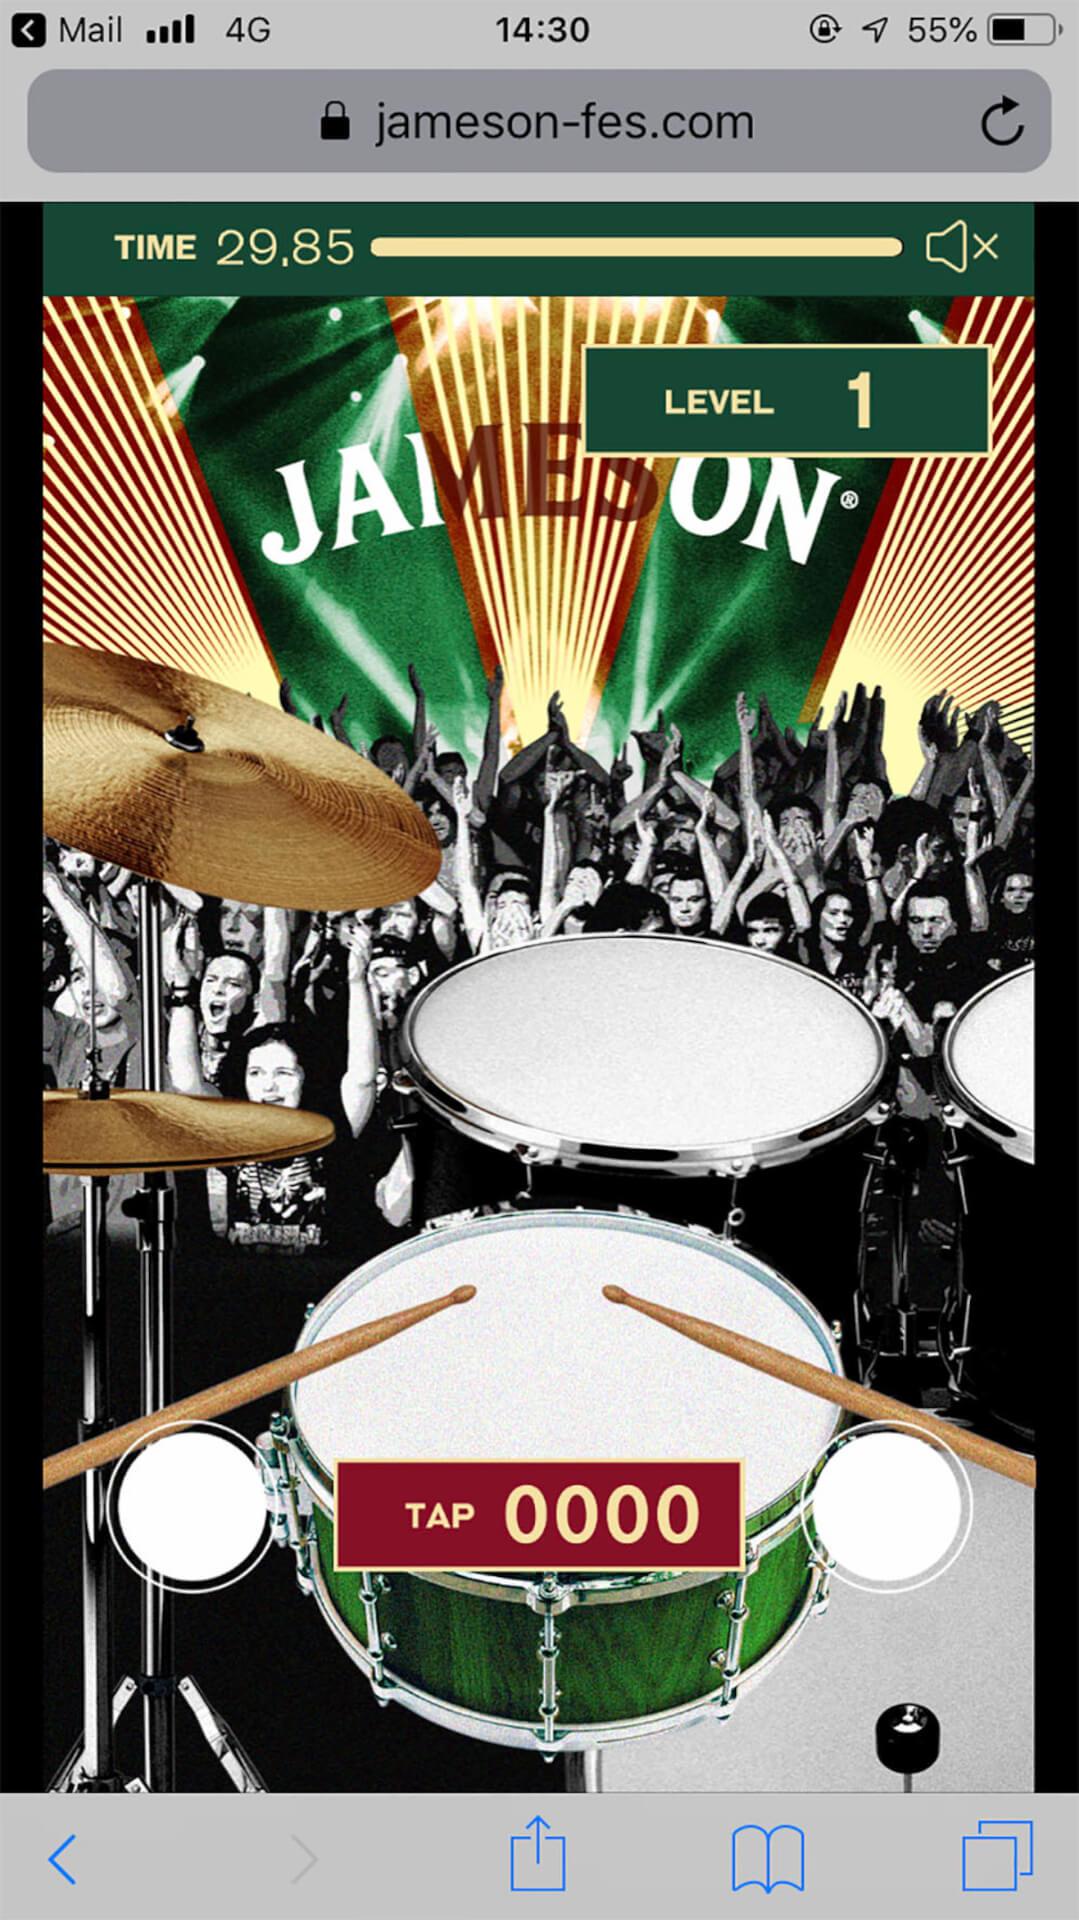 <Jameson Halloween Fes 2>本日開催!ジェムソンがコラボする3バンド、DATS、グッドモーニングアメリカらに注目 music190917_jameson_halloween_10